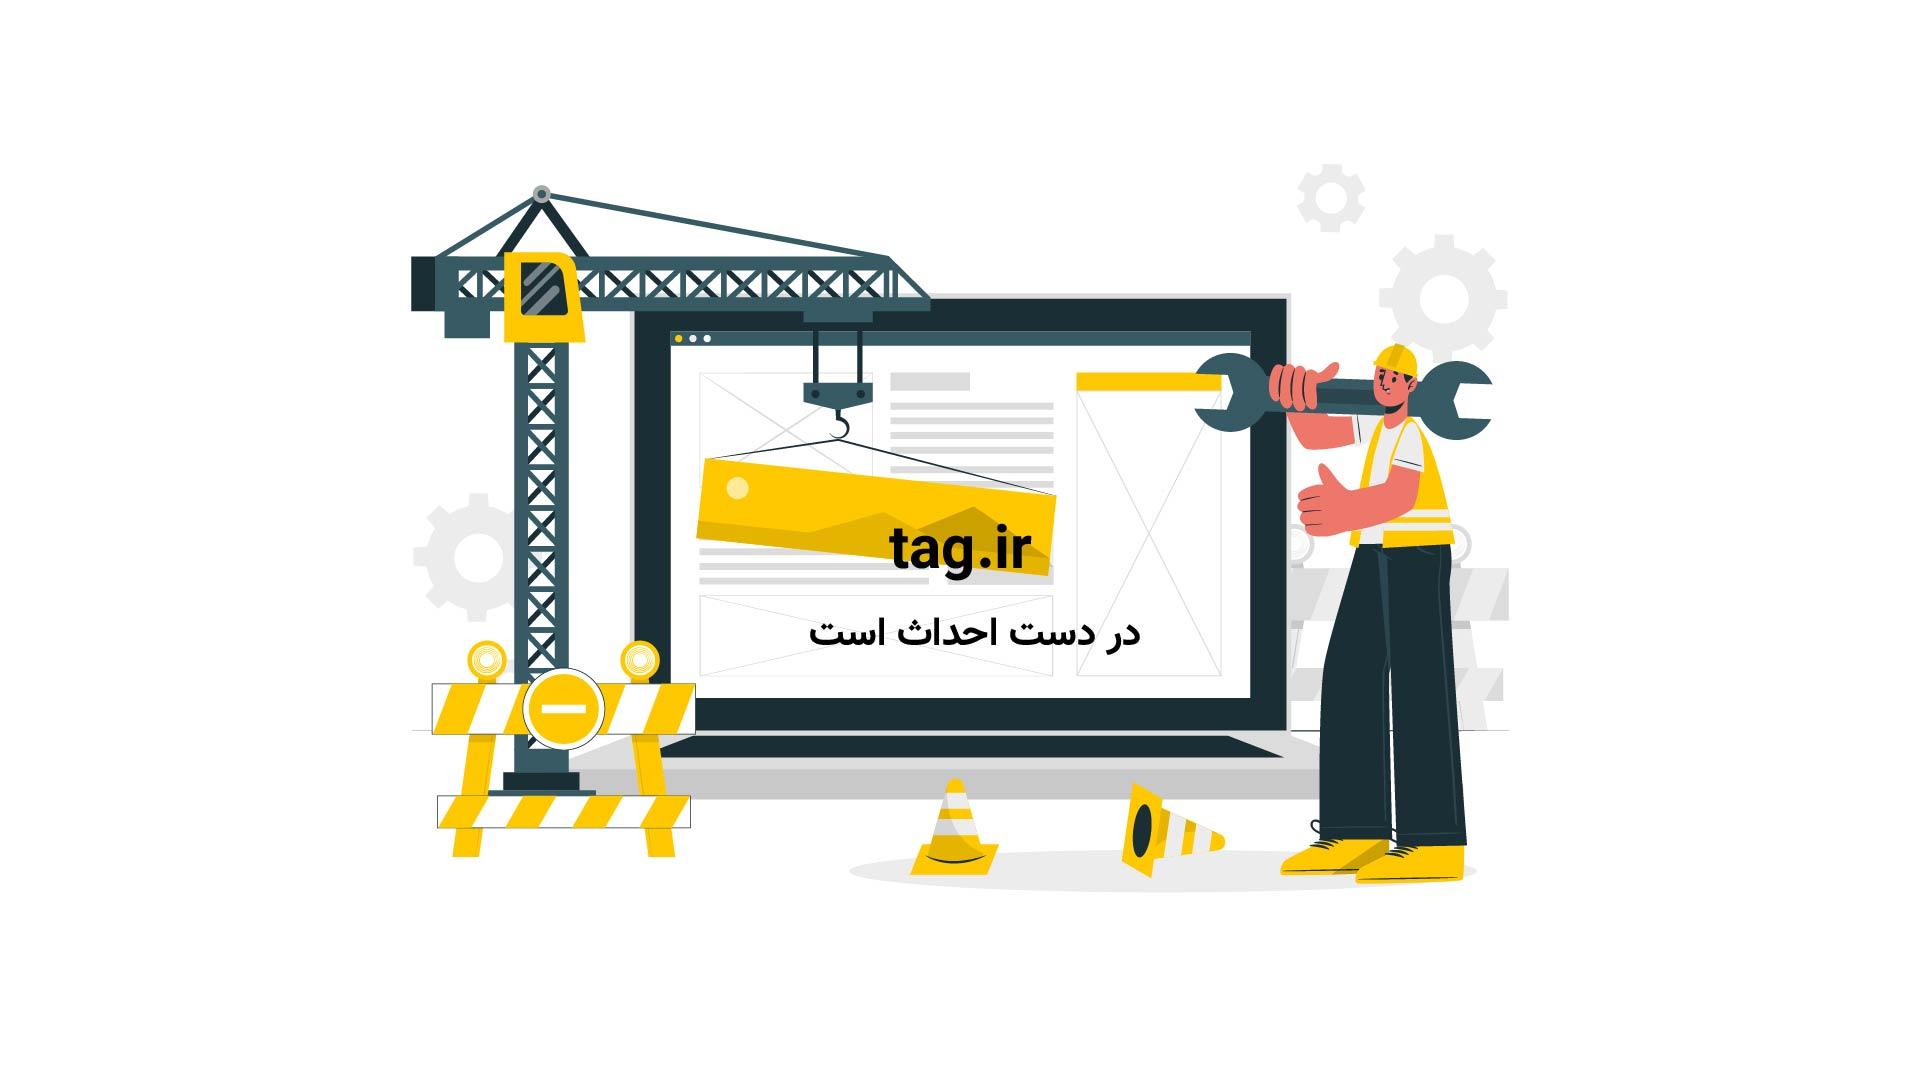 نهنگ | تگ